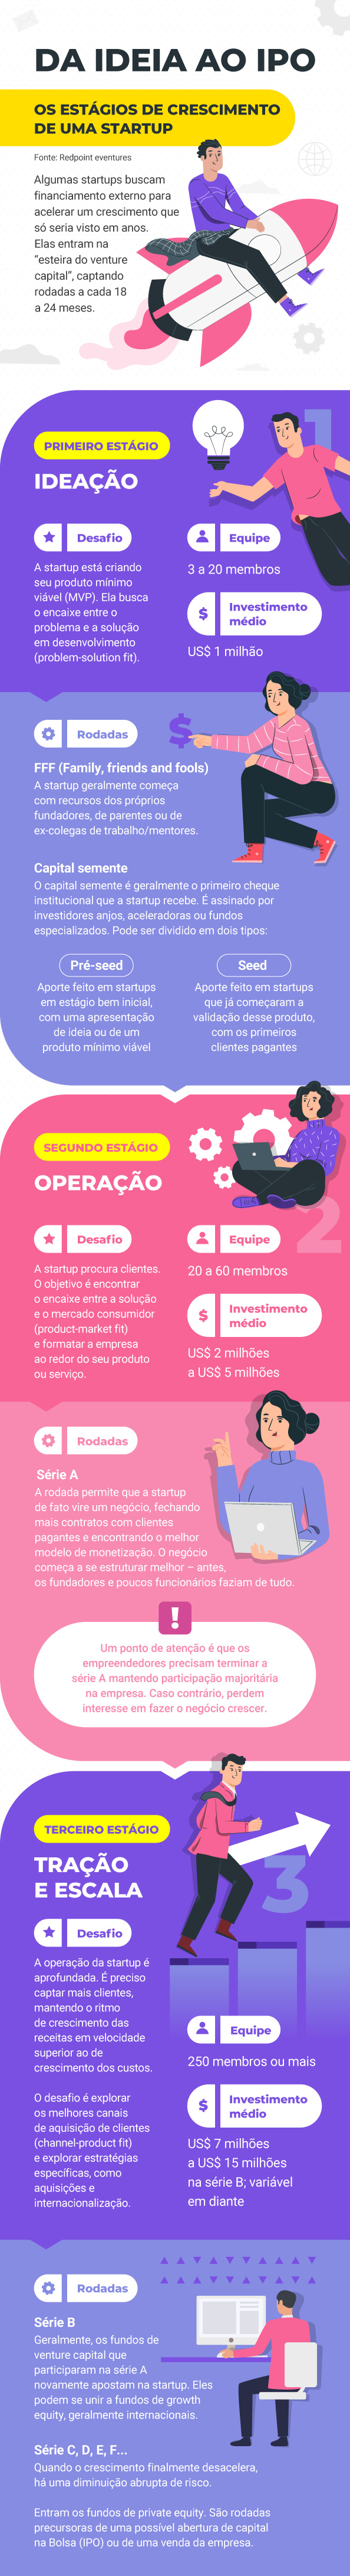 Infográfico da ideia ao ipo